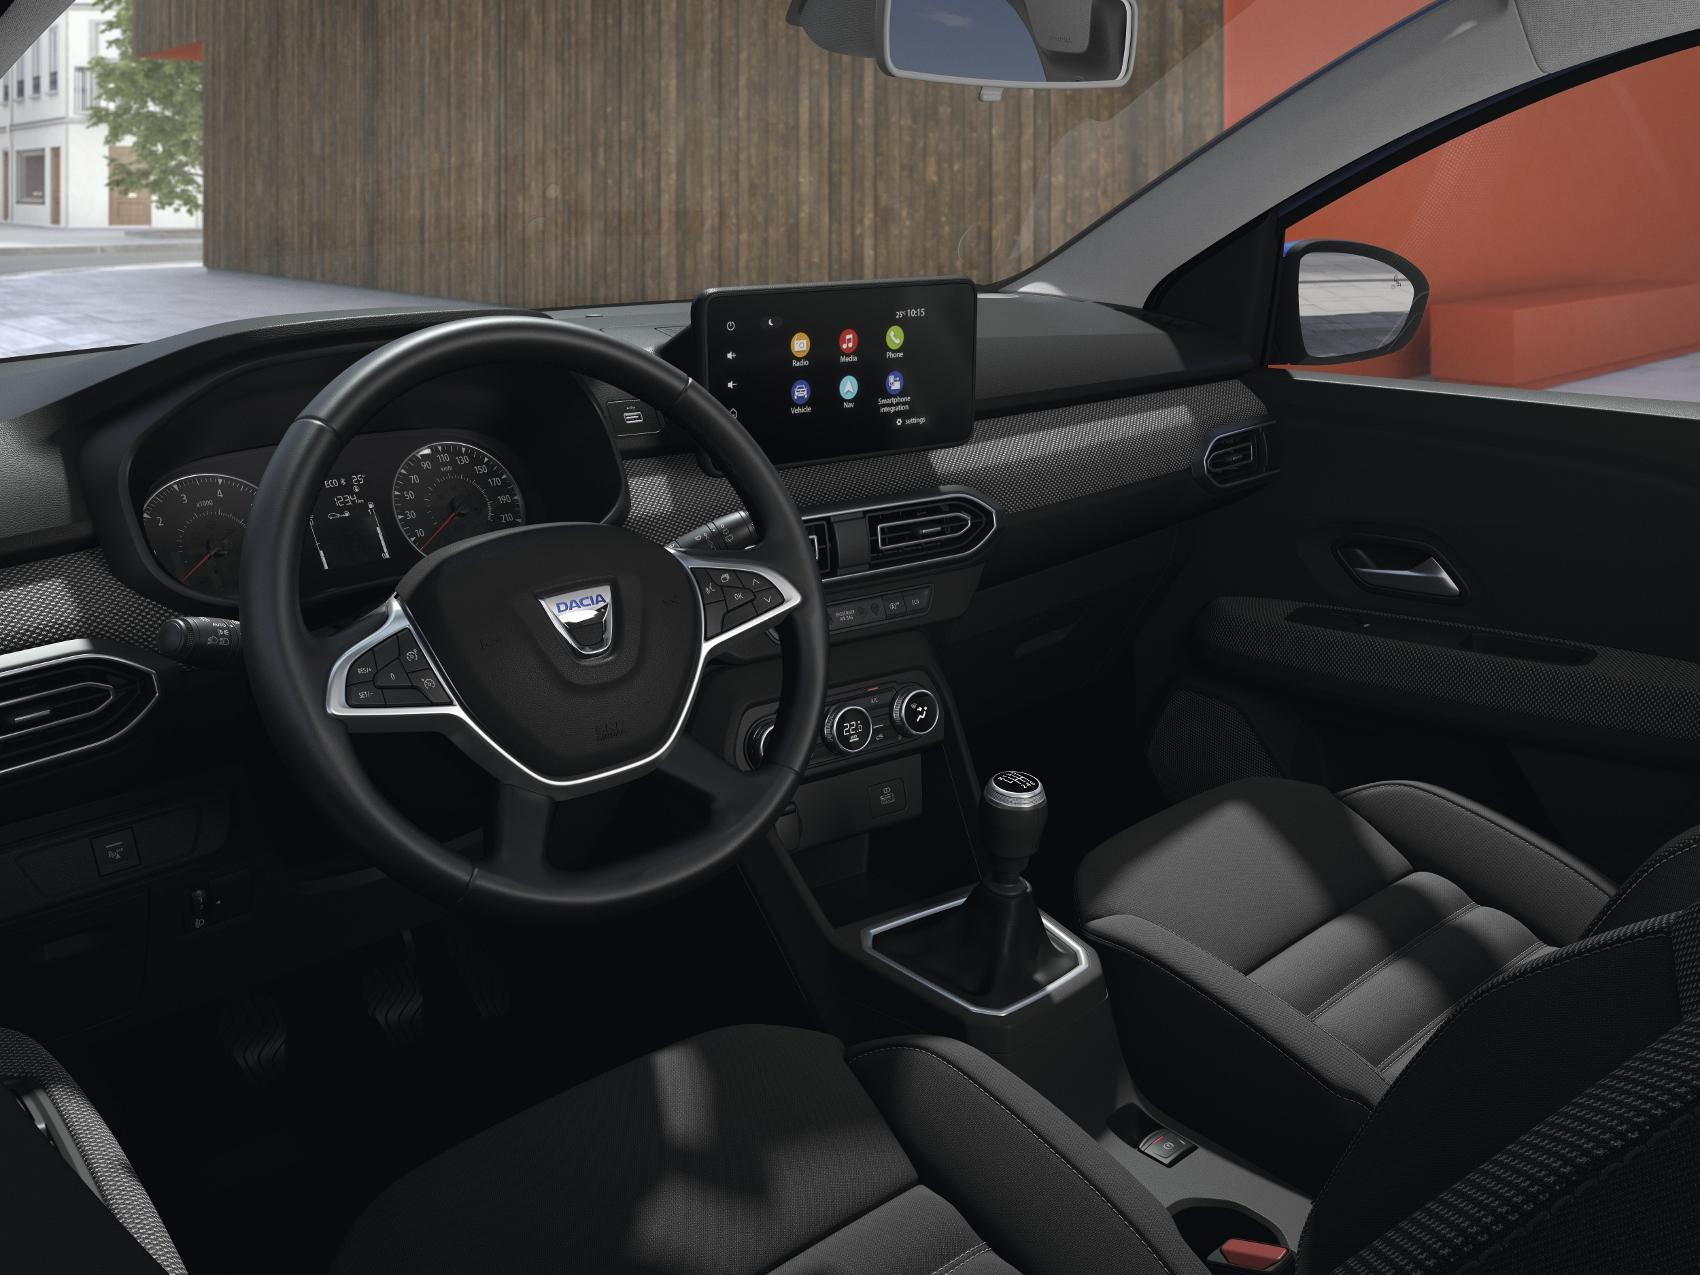 2020 - New Dacia SANDERO (1700x1275)